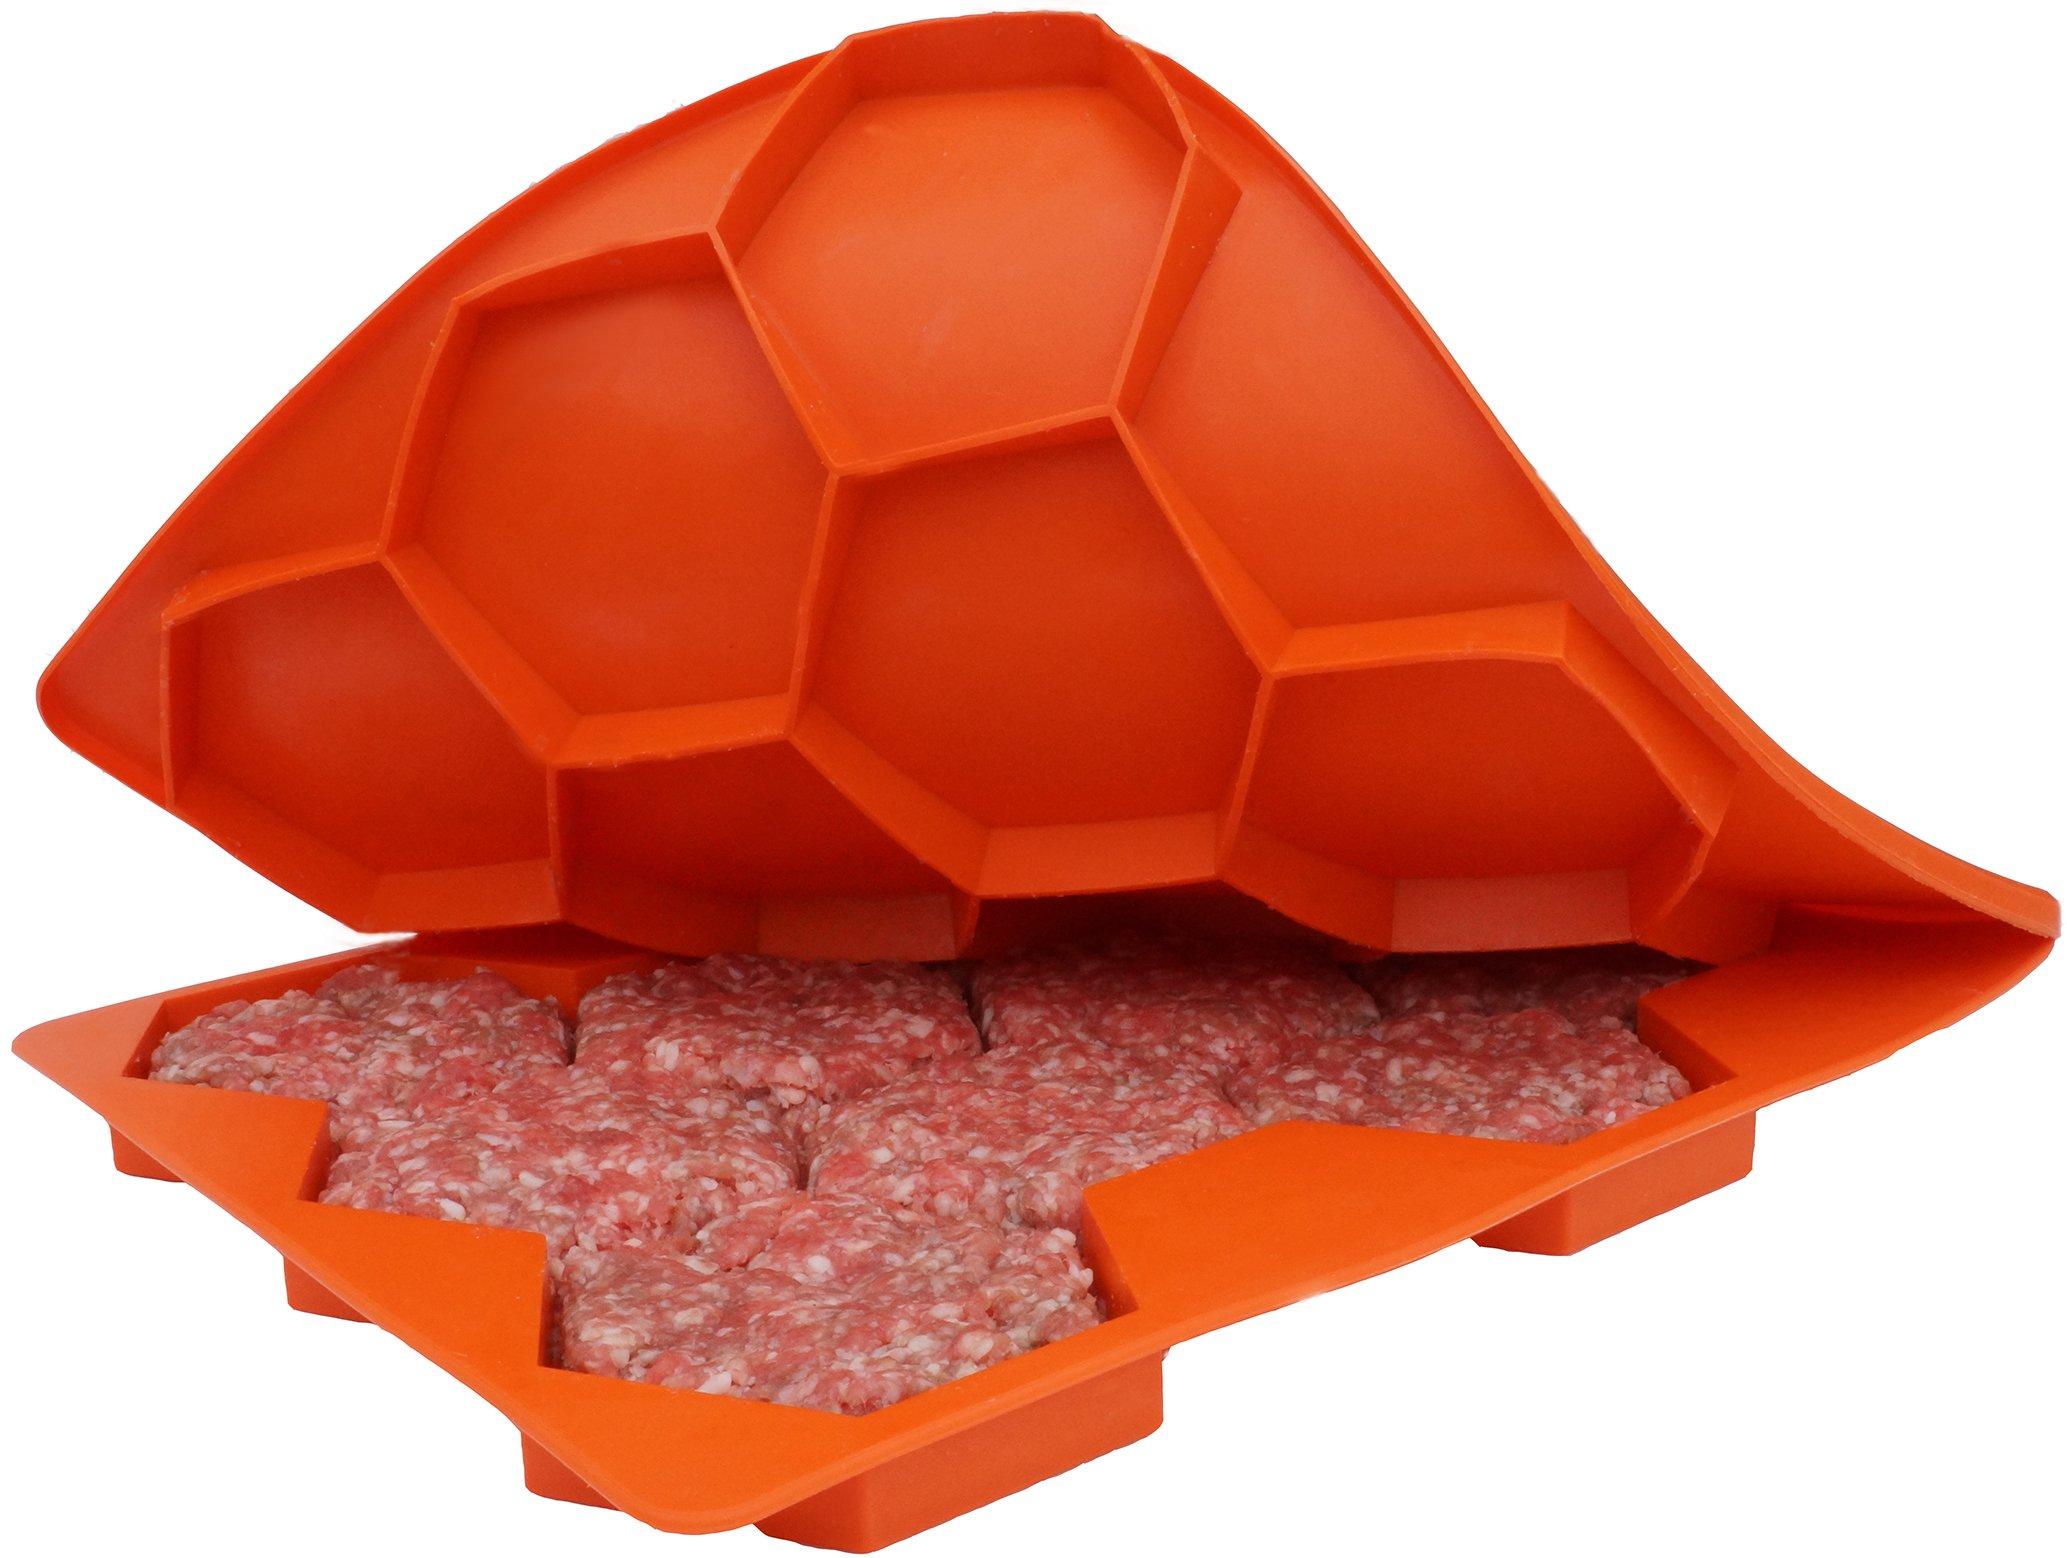 Shape+Store Burger Master Sliders 10 in 1 Innovative Burger Press and Freezer Container, 10-Patty, Blaze Orange